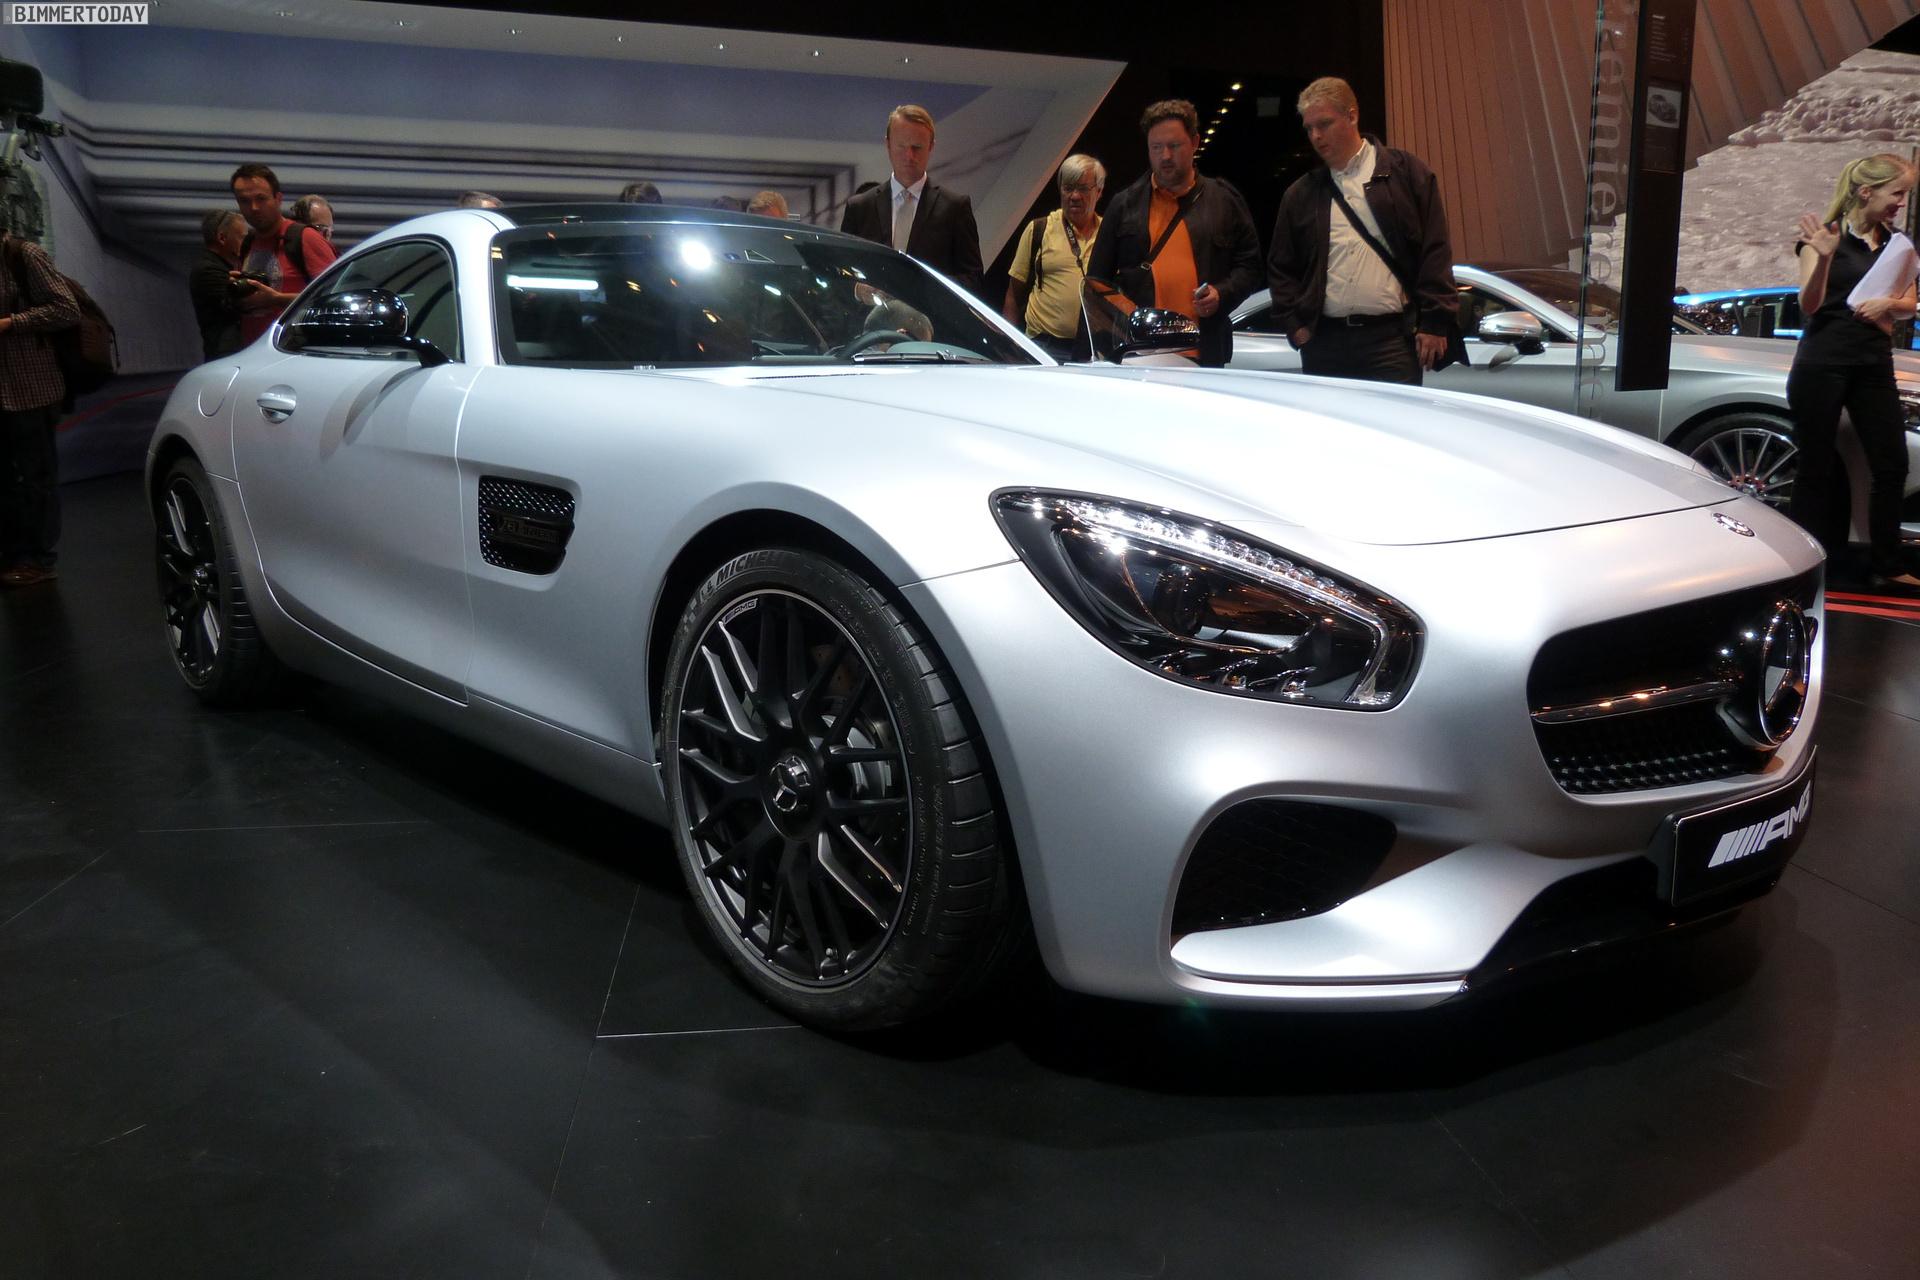 2017 Mercedes Benz Amg Gt V8 Biturbo Autosalon Paris Live 14 750x500